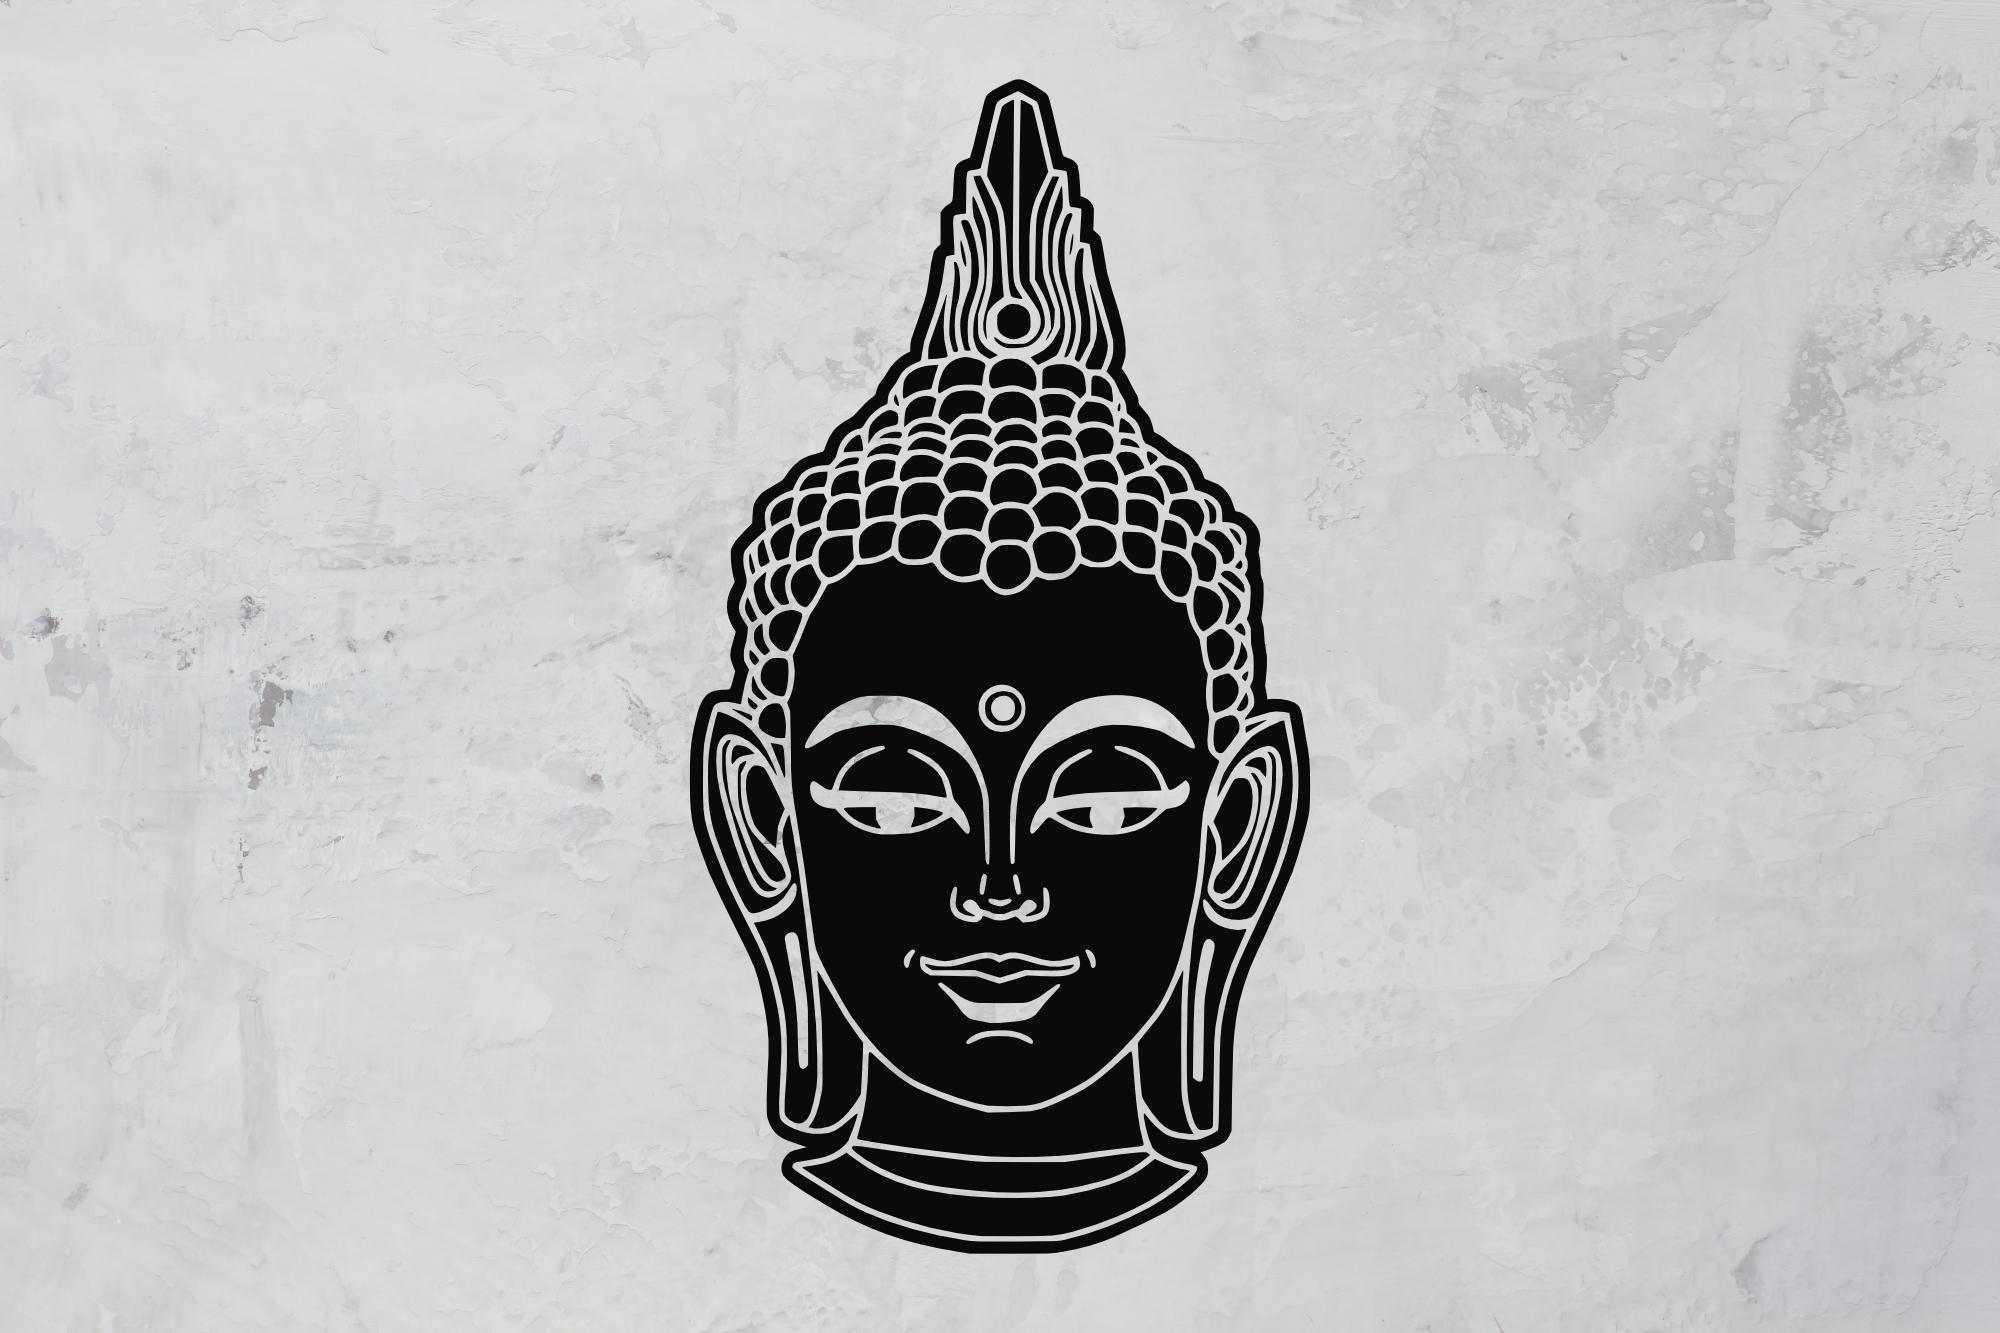 Plotterdatei BUDDHA V2 by SILHOUETTE LOVE